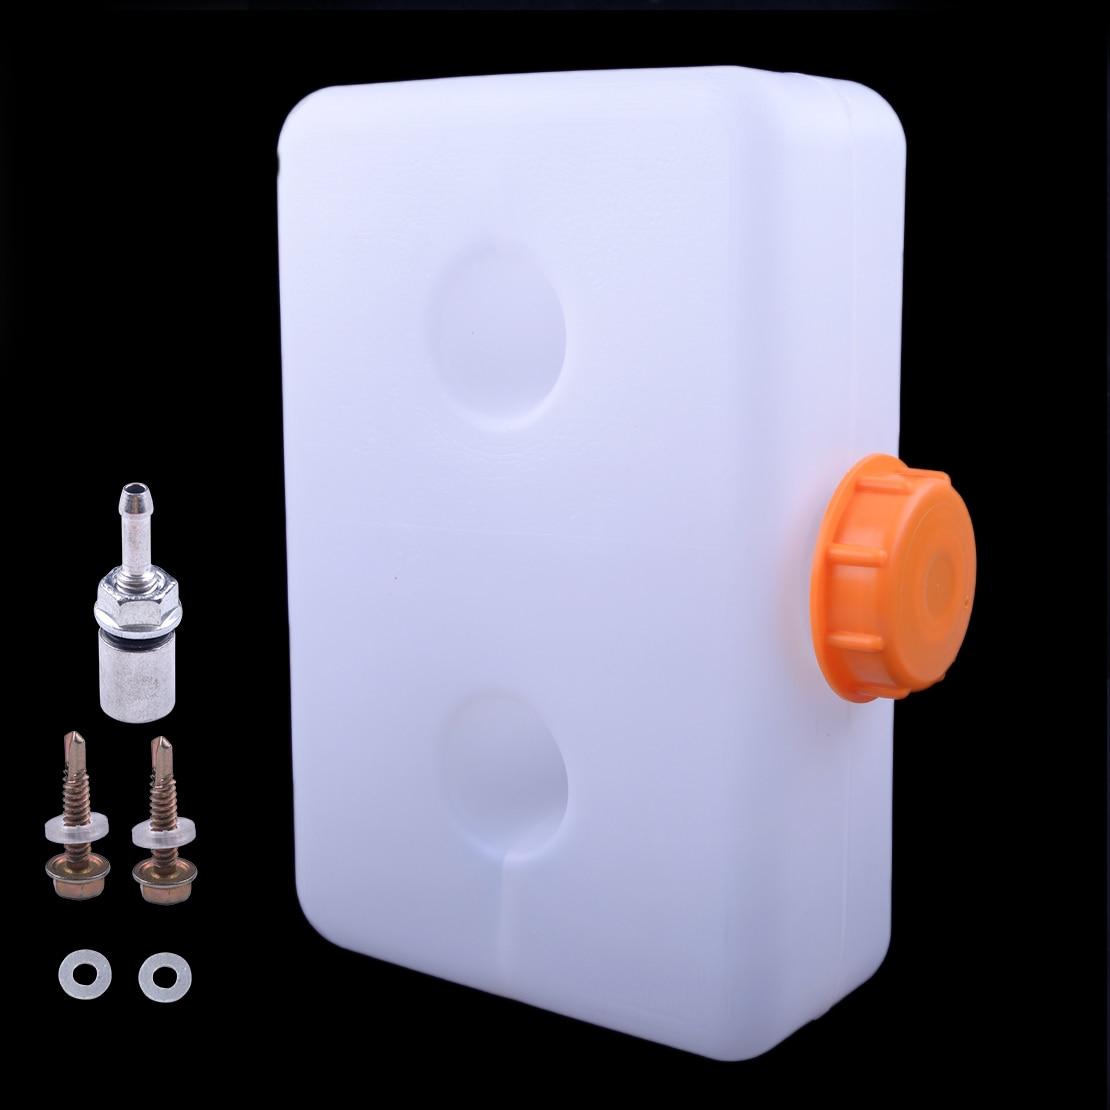 CITALL New 5L Fuel Tank Capacity White Plastic Parking Heater for Webasto Eberspacher Car Truck Boat Caravan